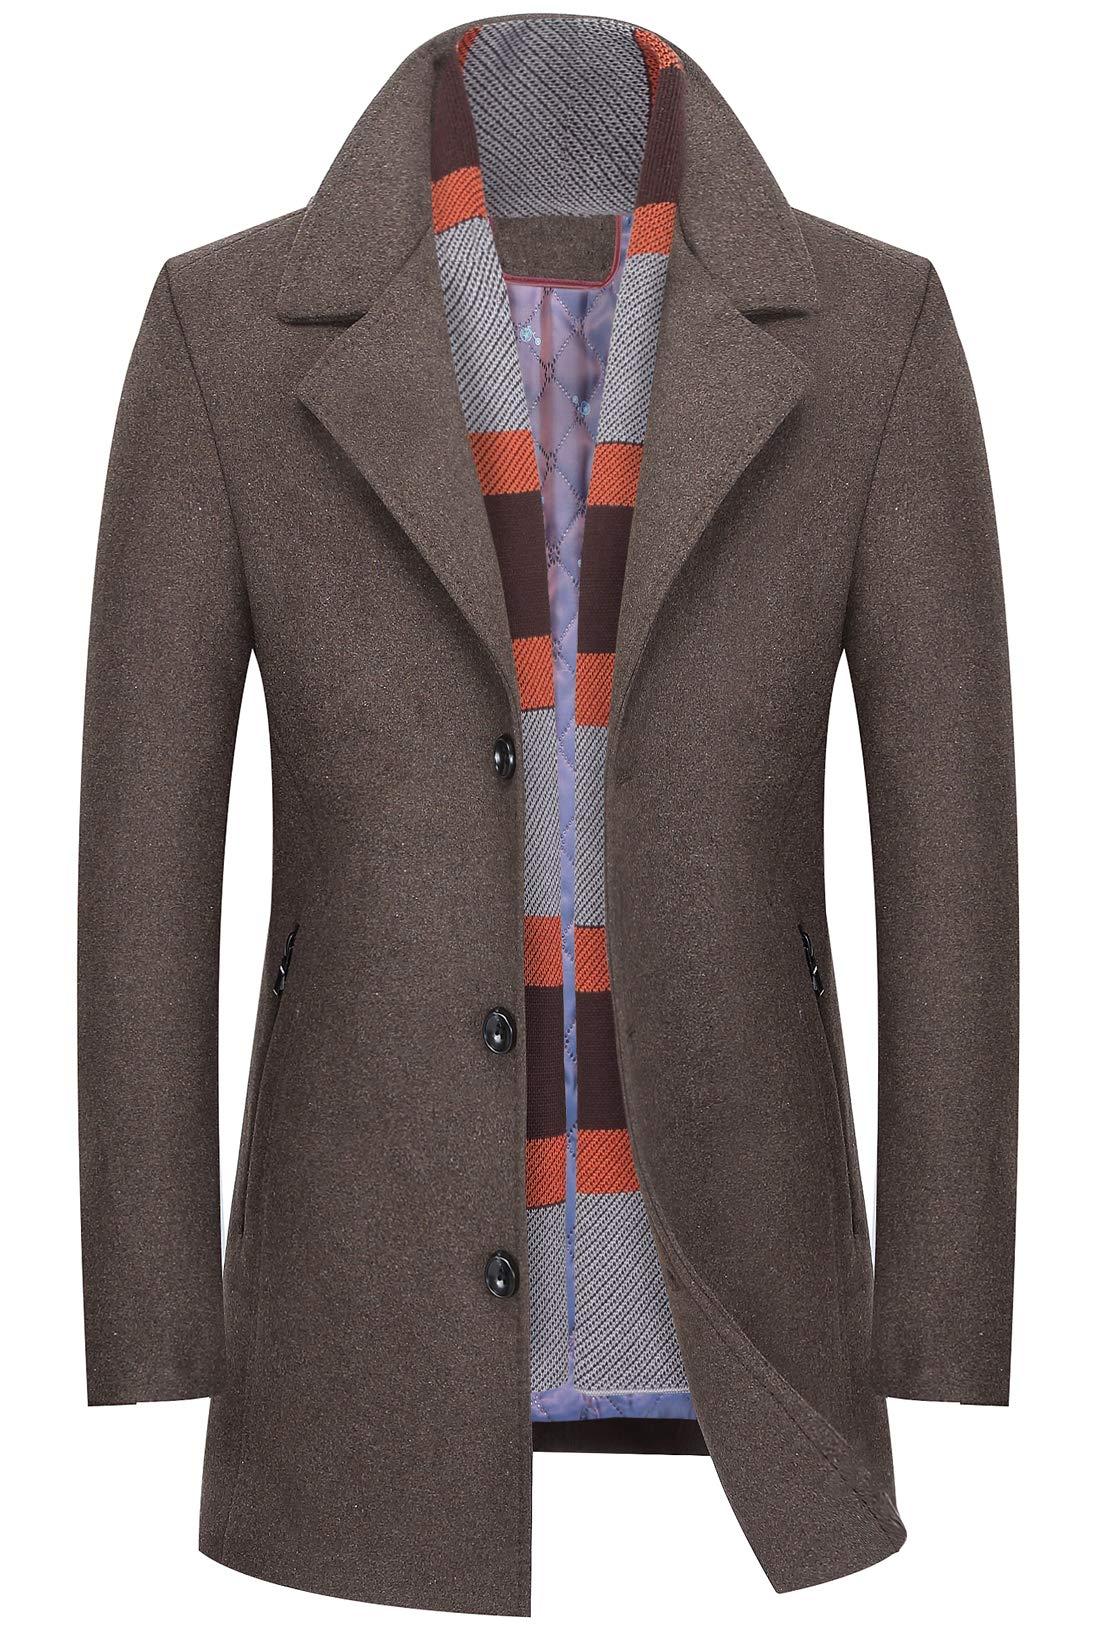 chouyatou Men's Winter Notched Collar Single Breasted Quilted Wool Midi Coats Plaid Scarf (Khaki, Medium) by chouyatou